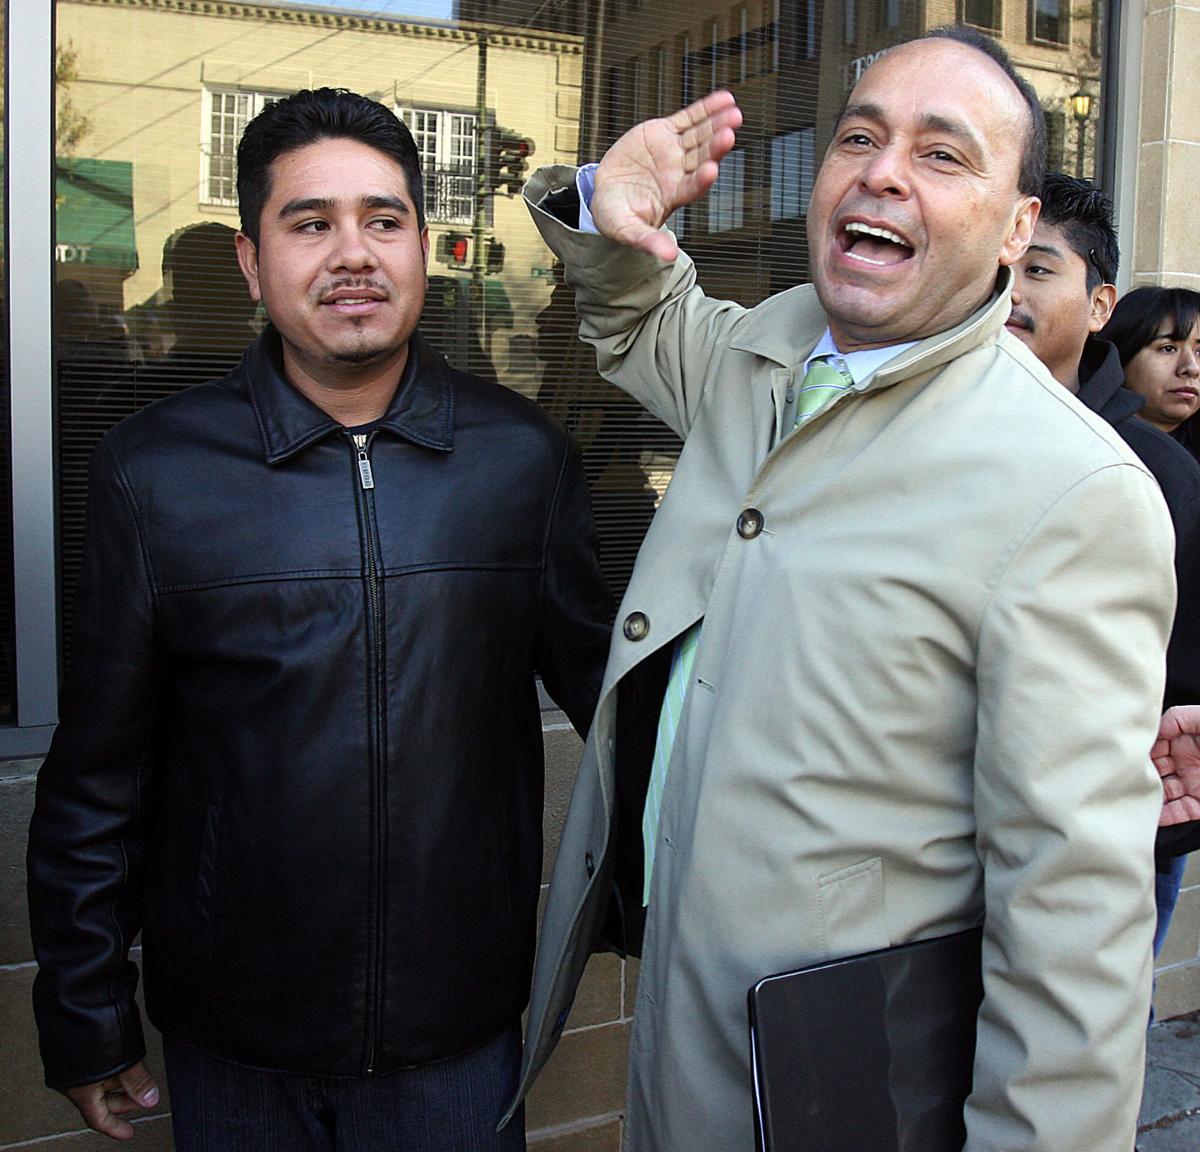 Congressman aims to block deportation of S.C. man